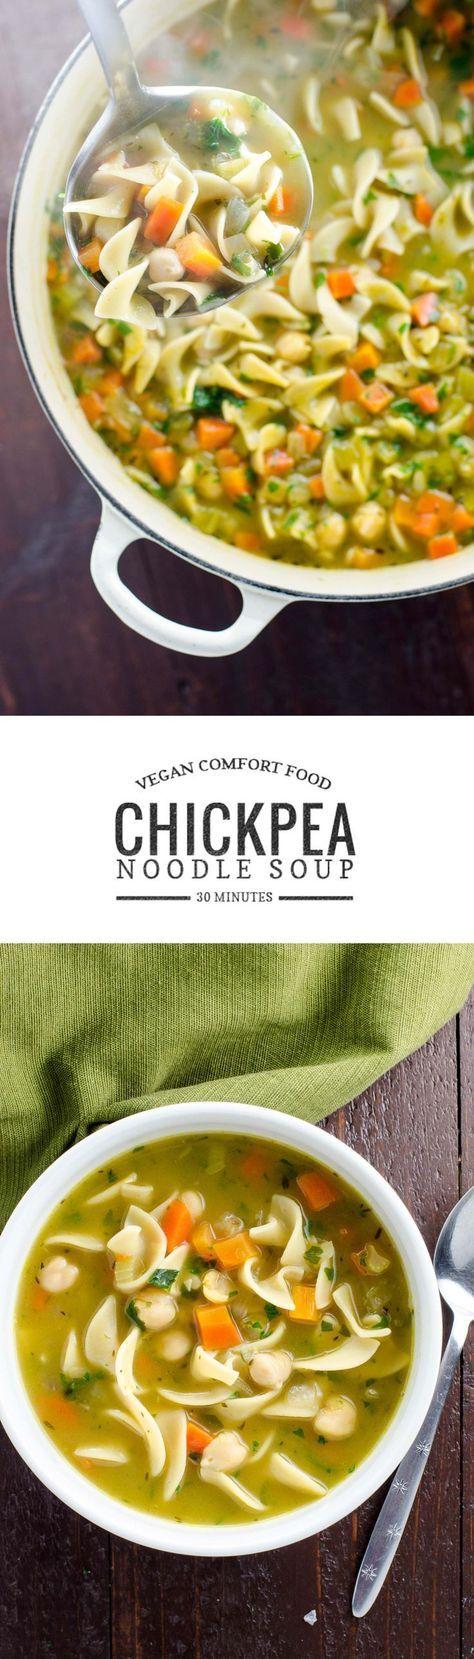 Chickpea Noodle Soup #comfortfoods